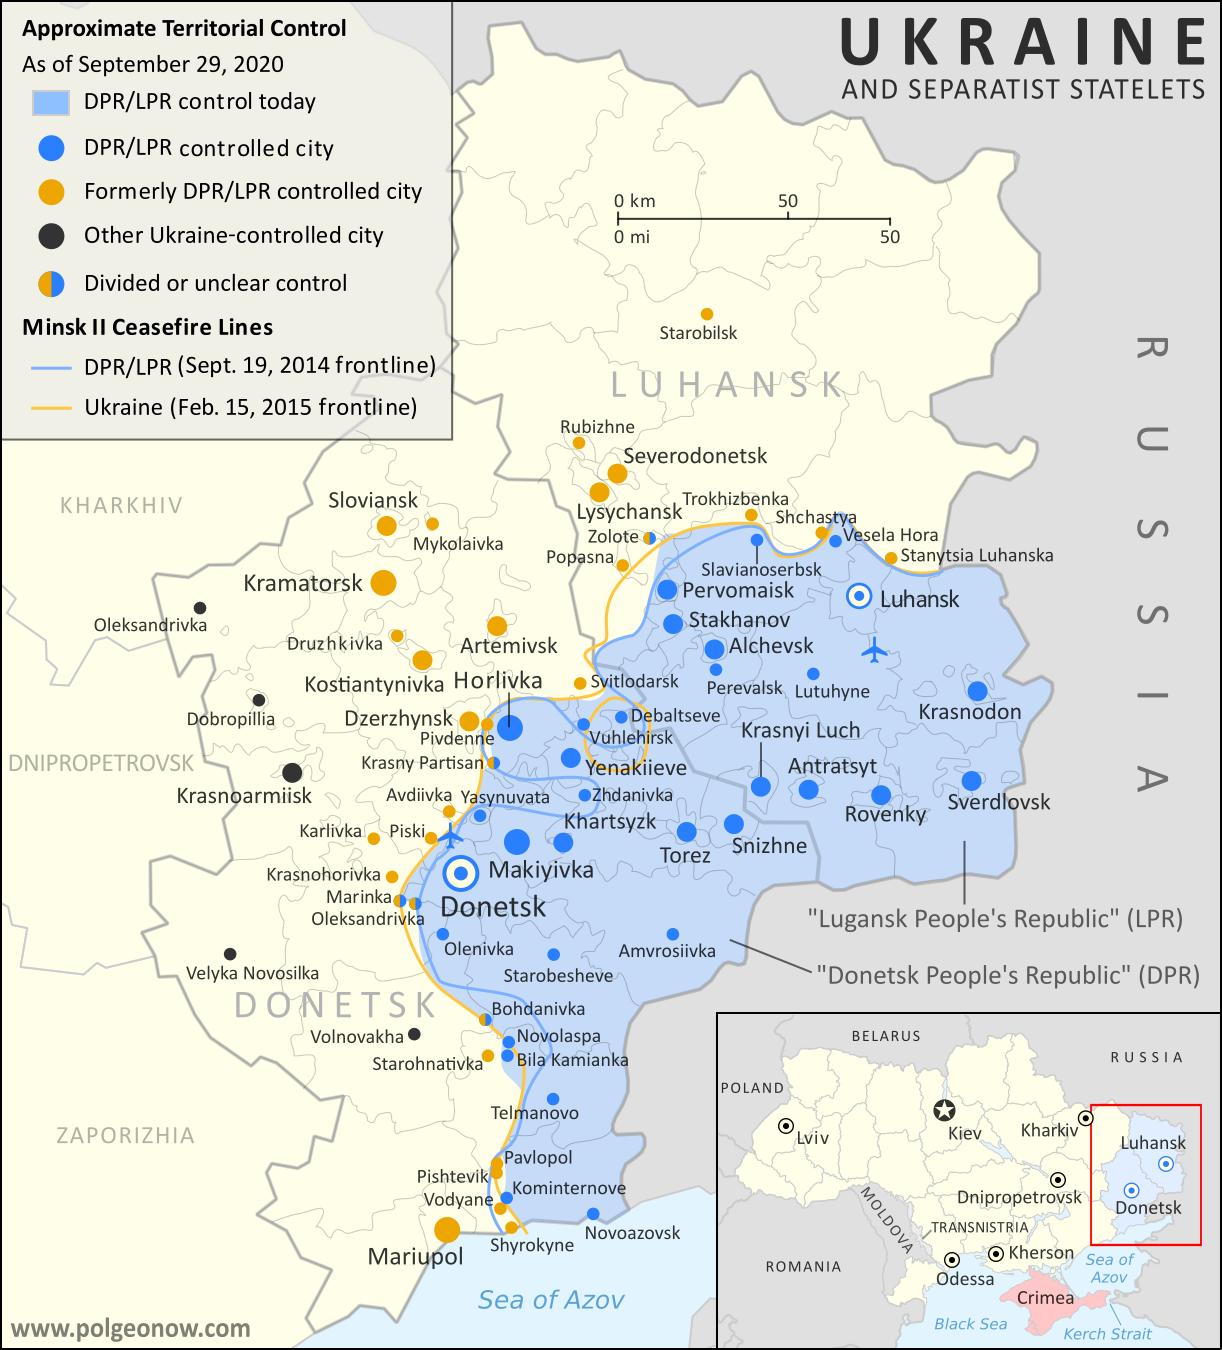 Ukraine Christmas Ceasefire 2020 Ukraine War Control Map & Report: September 2020   Political